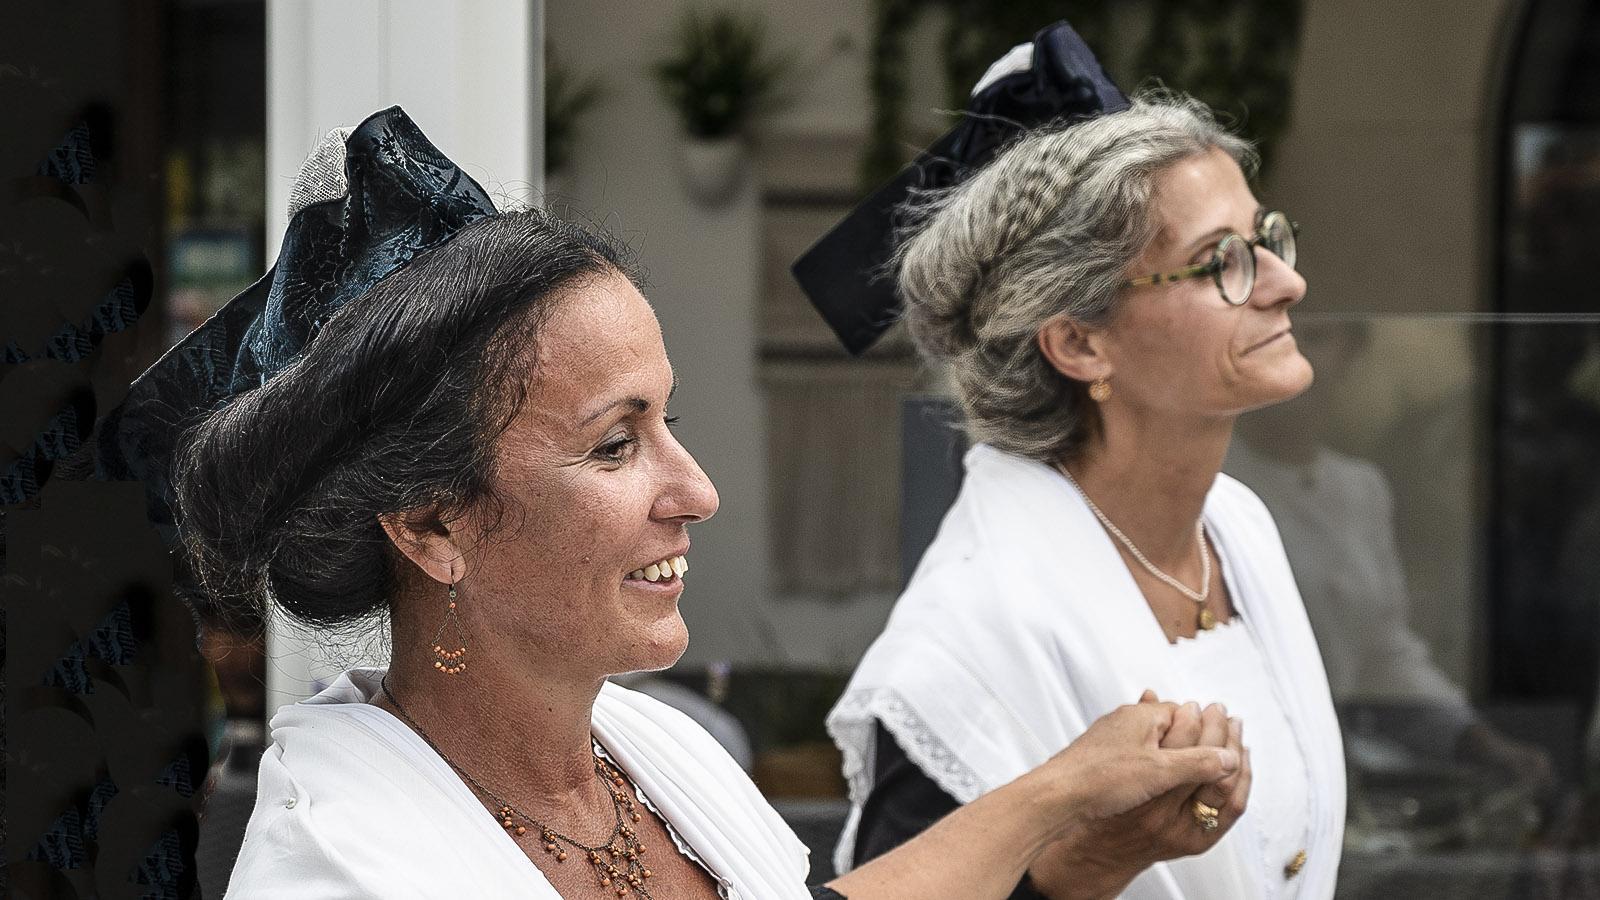 Arlésiennes in Les Saintes-Maries-de-la-Mer. Foto: Hilke Maunder